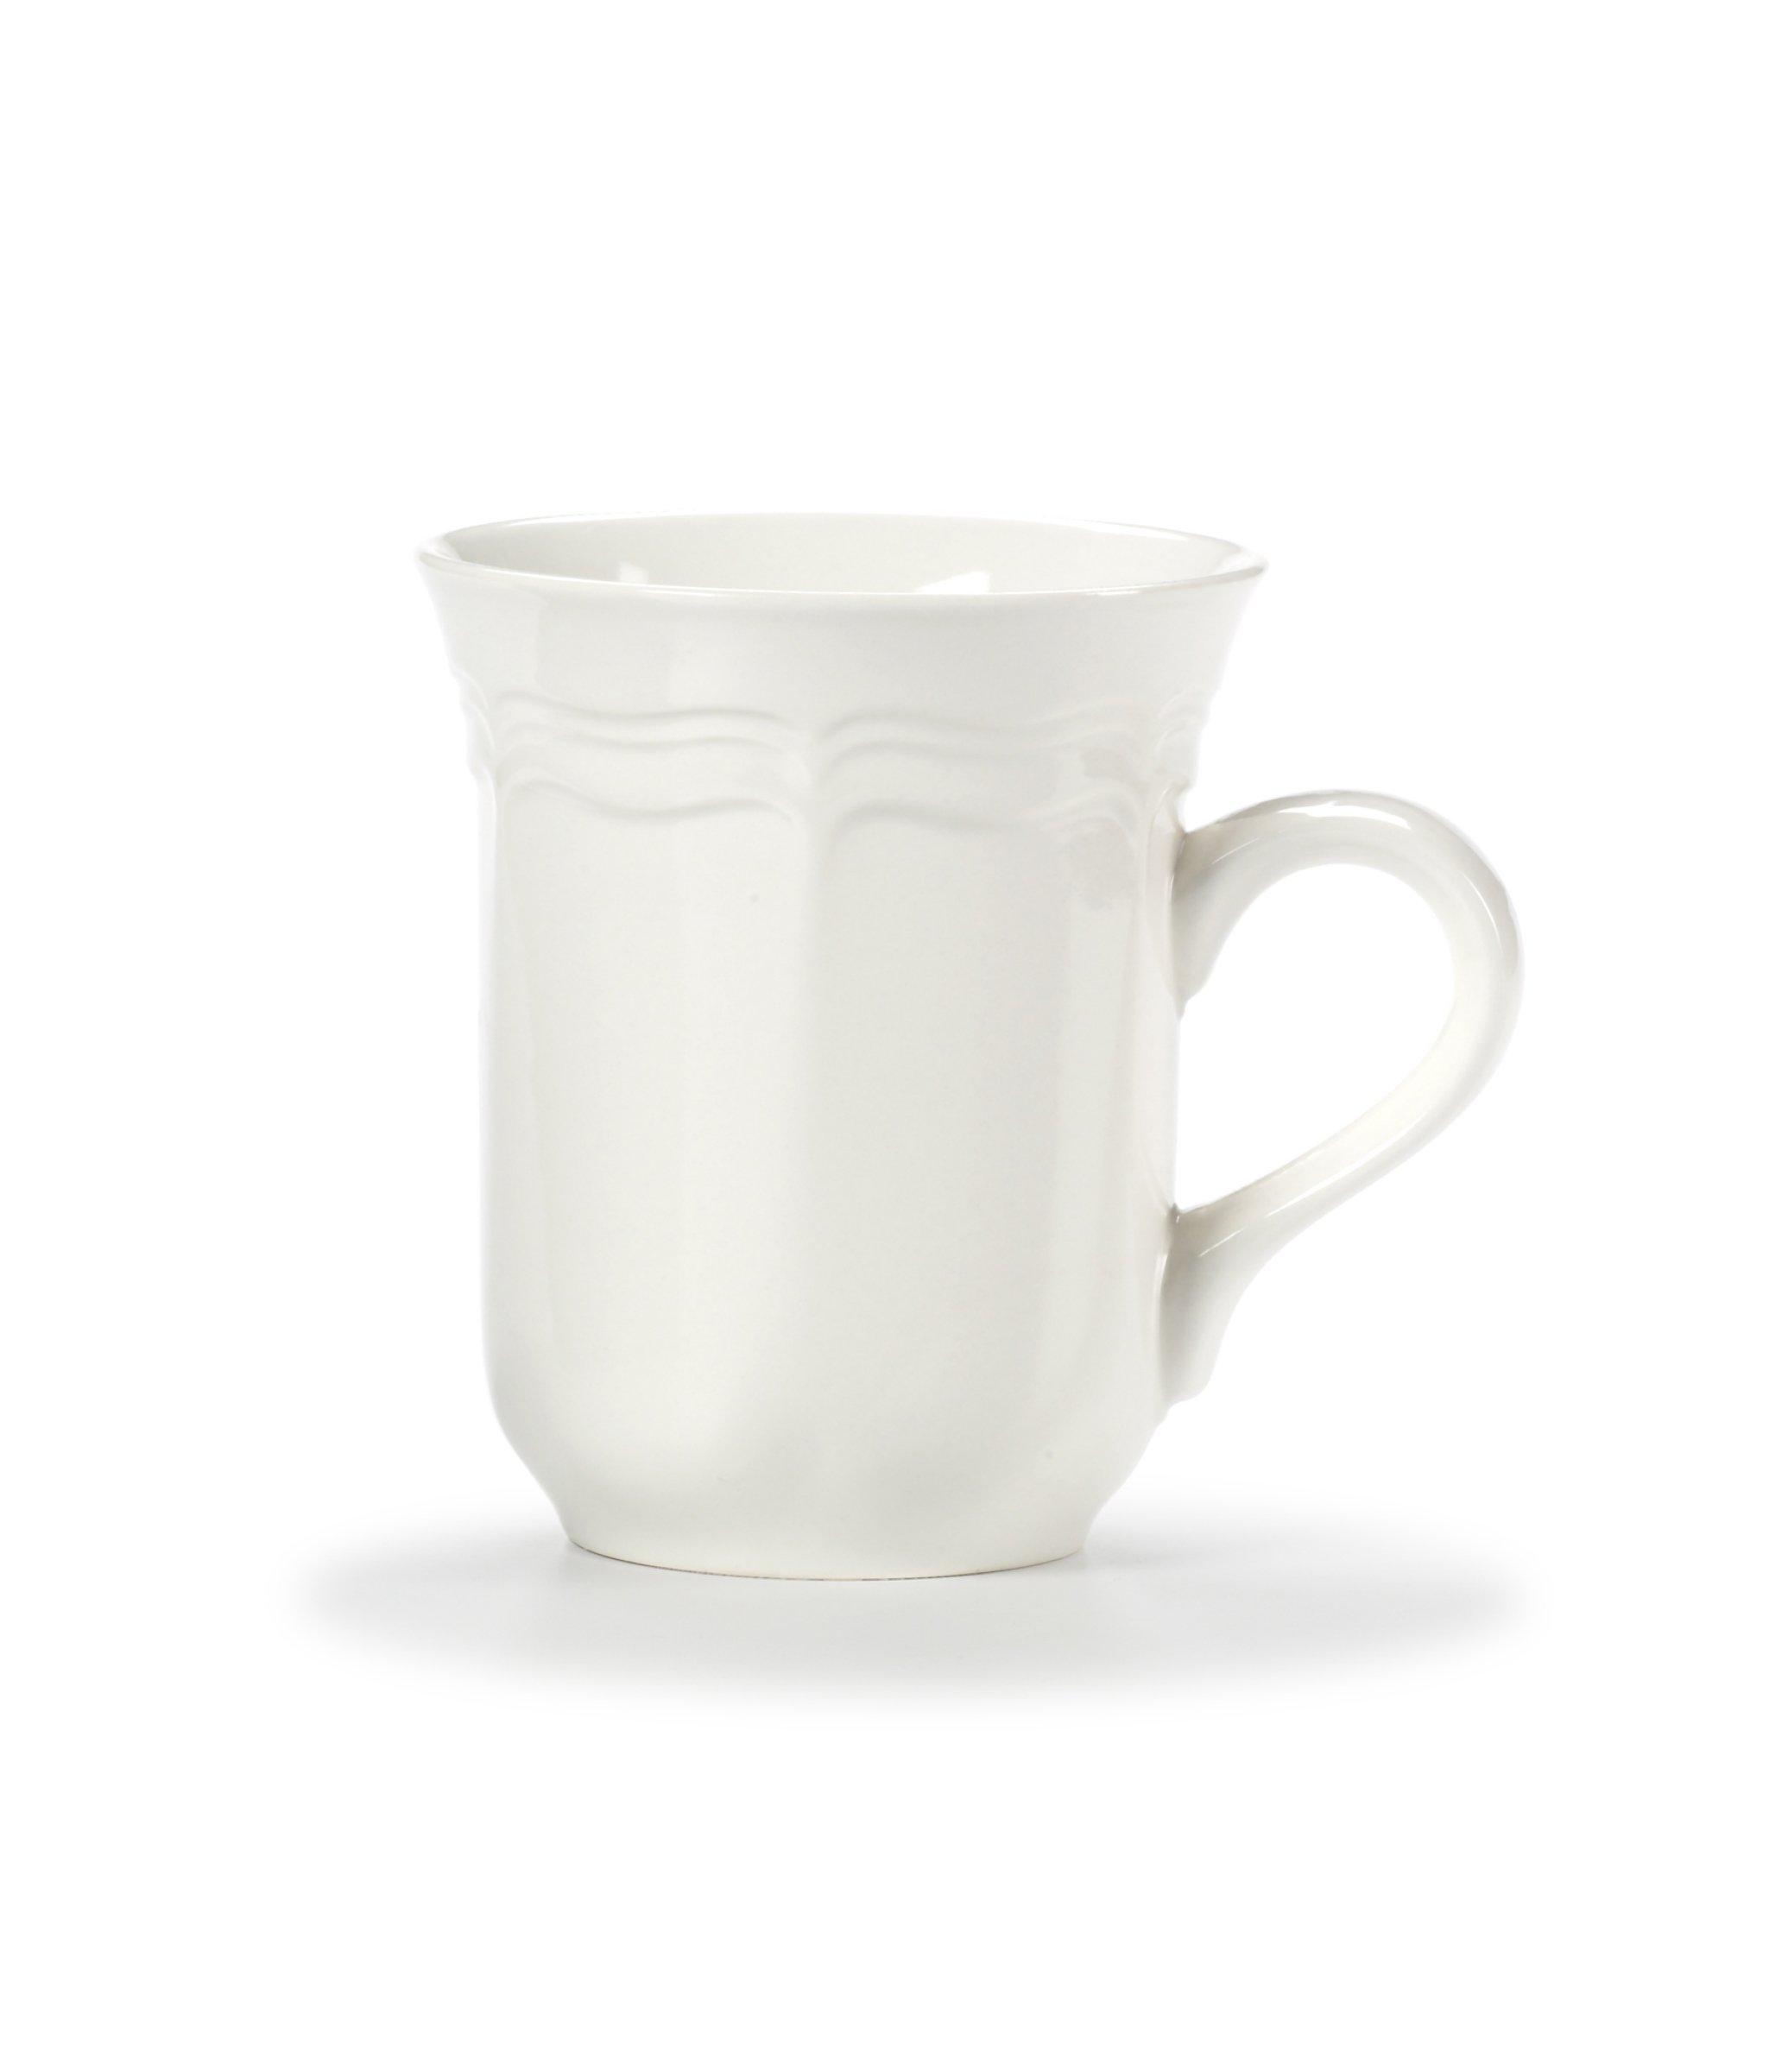 Mikasa French Countryside Cappuccino Mug, White